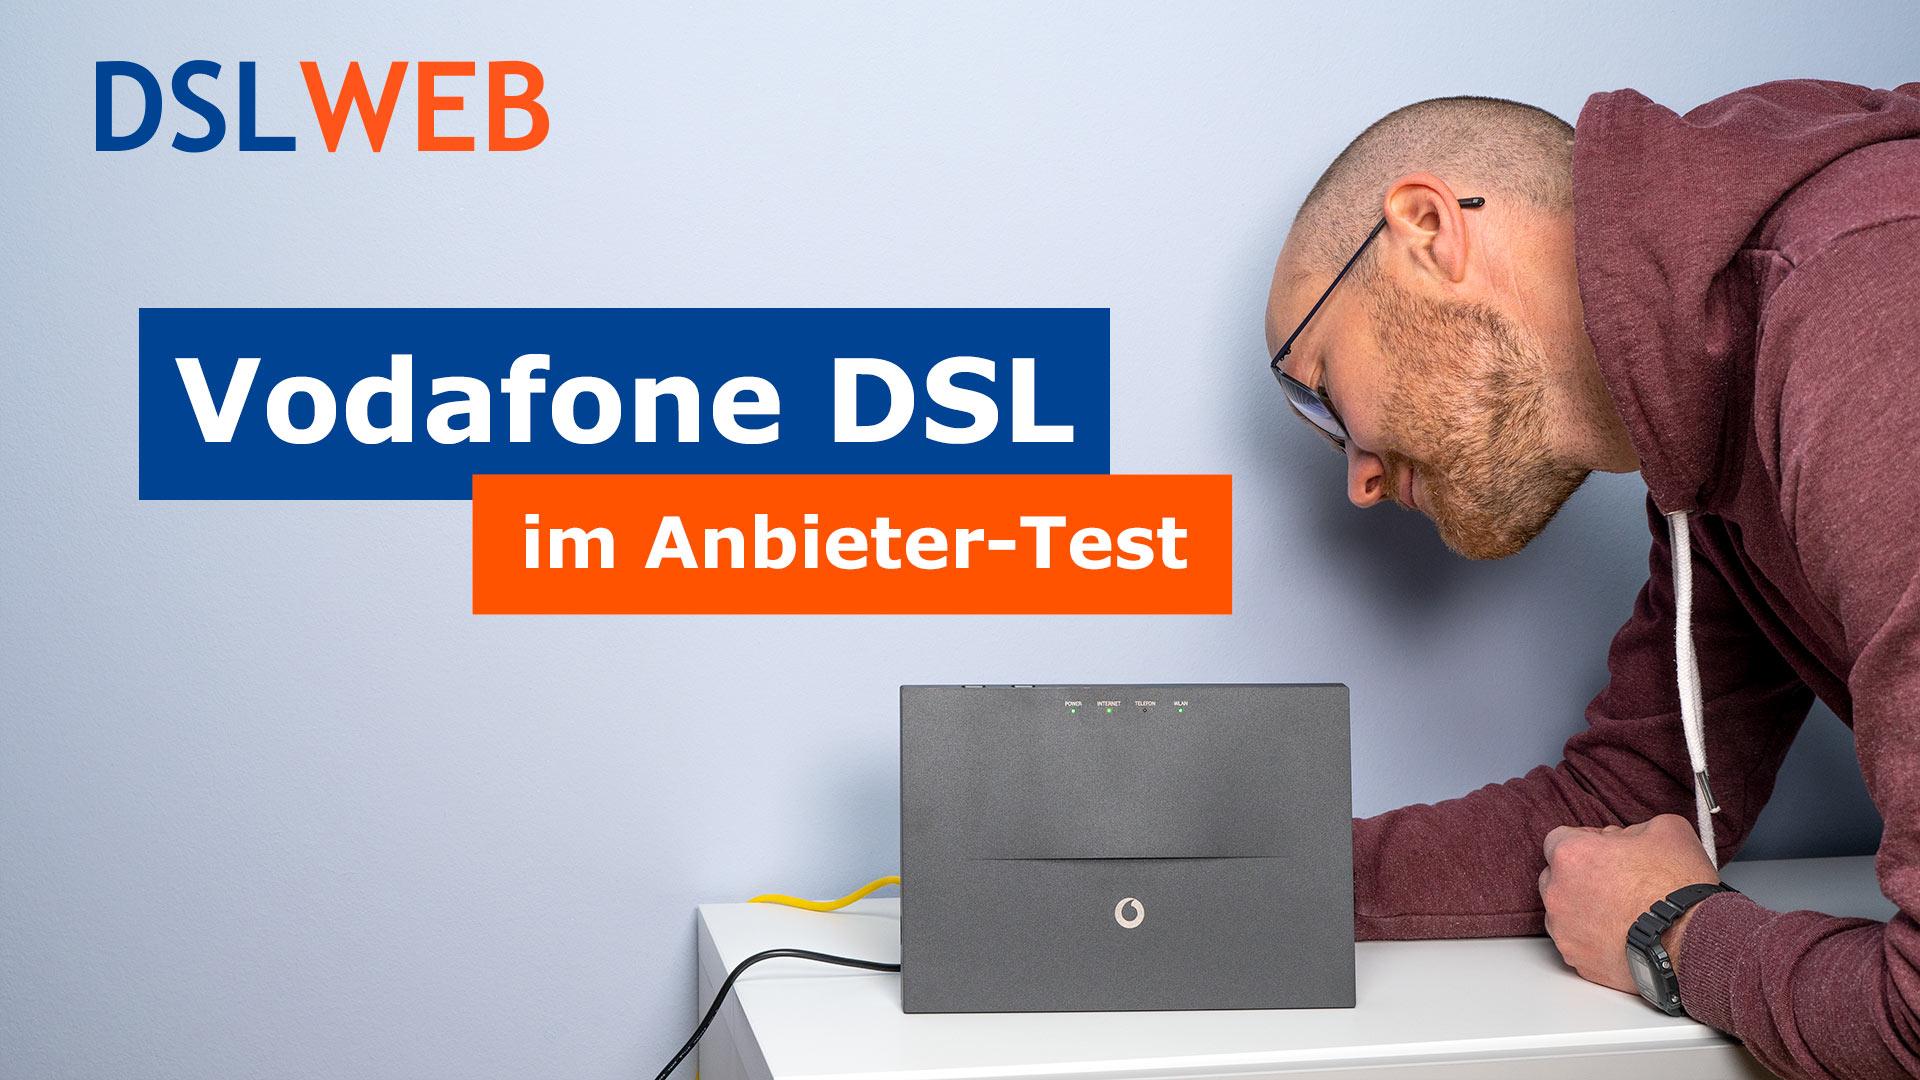 Vodafone DSL im Anbietertest